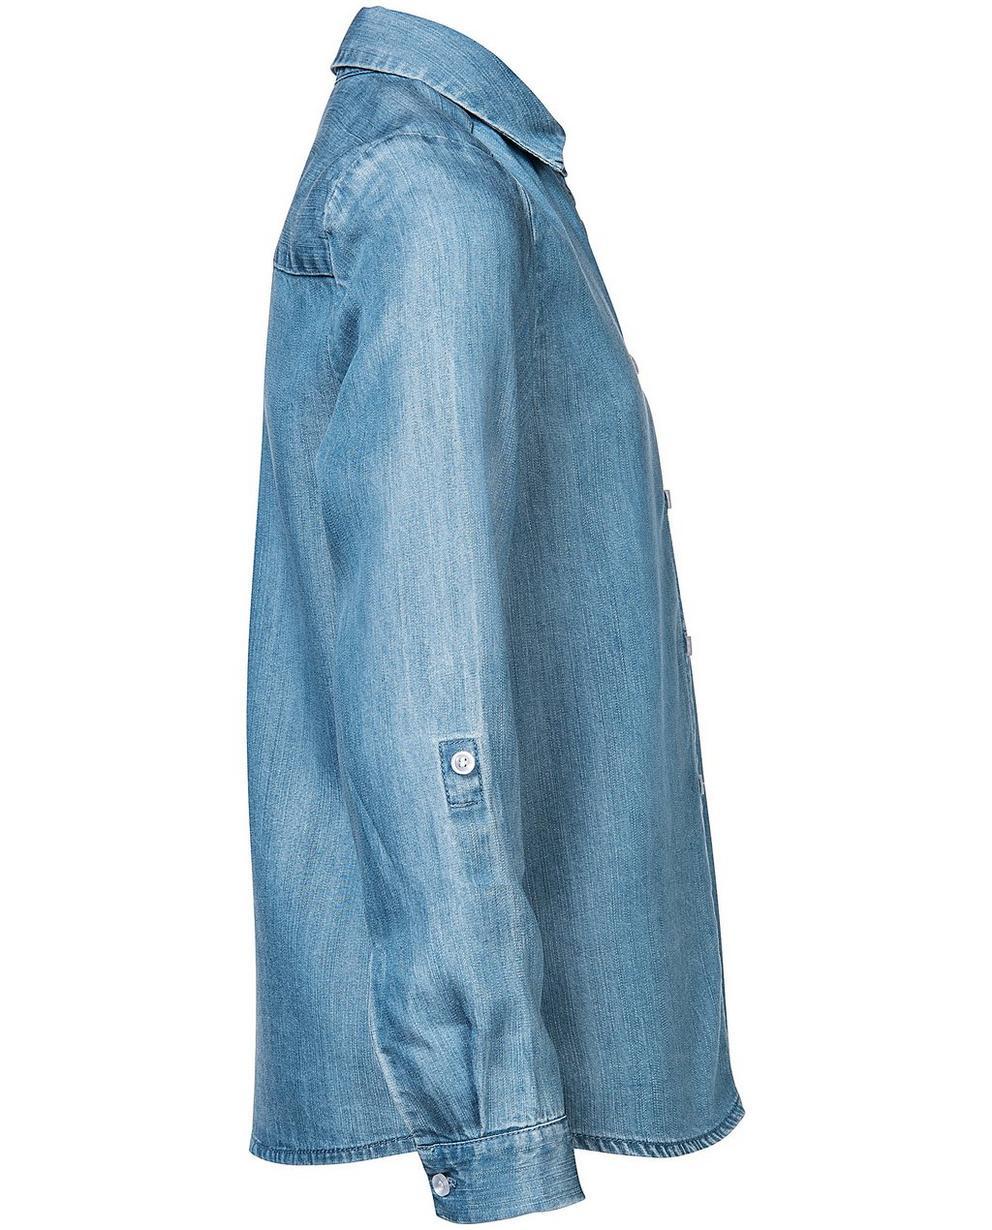 Hemden - Aqua - Hemd aus Lyocell mit Denim-Look